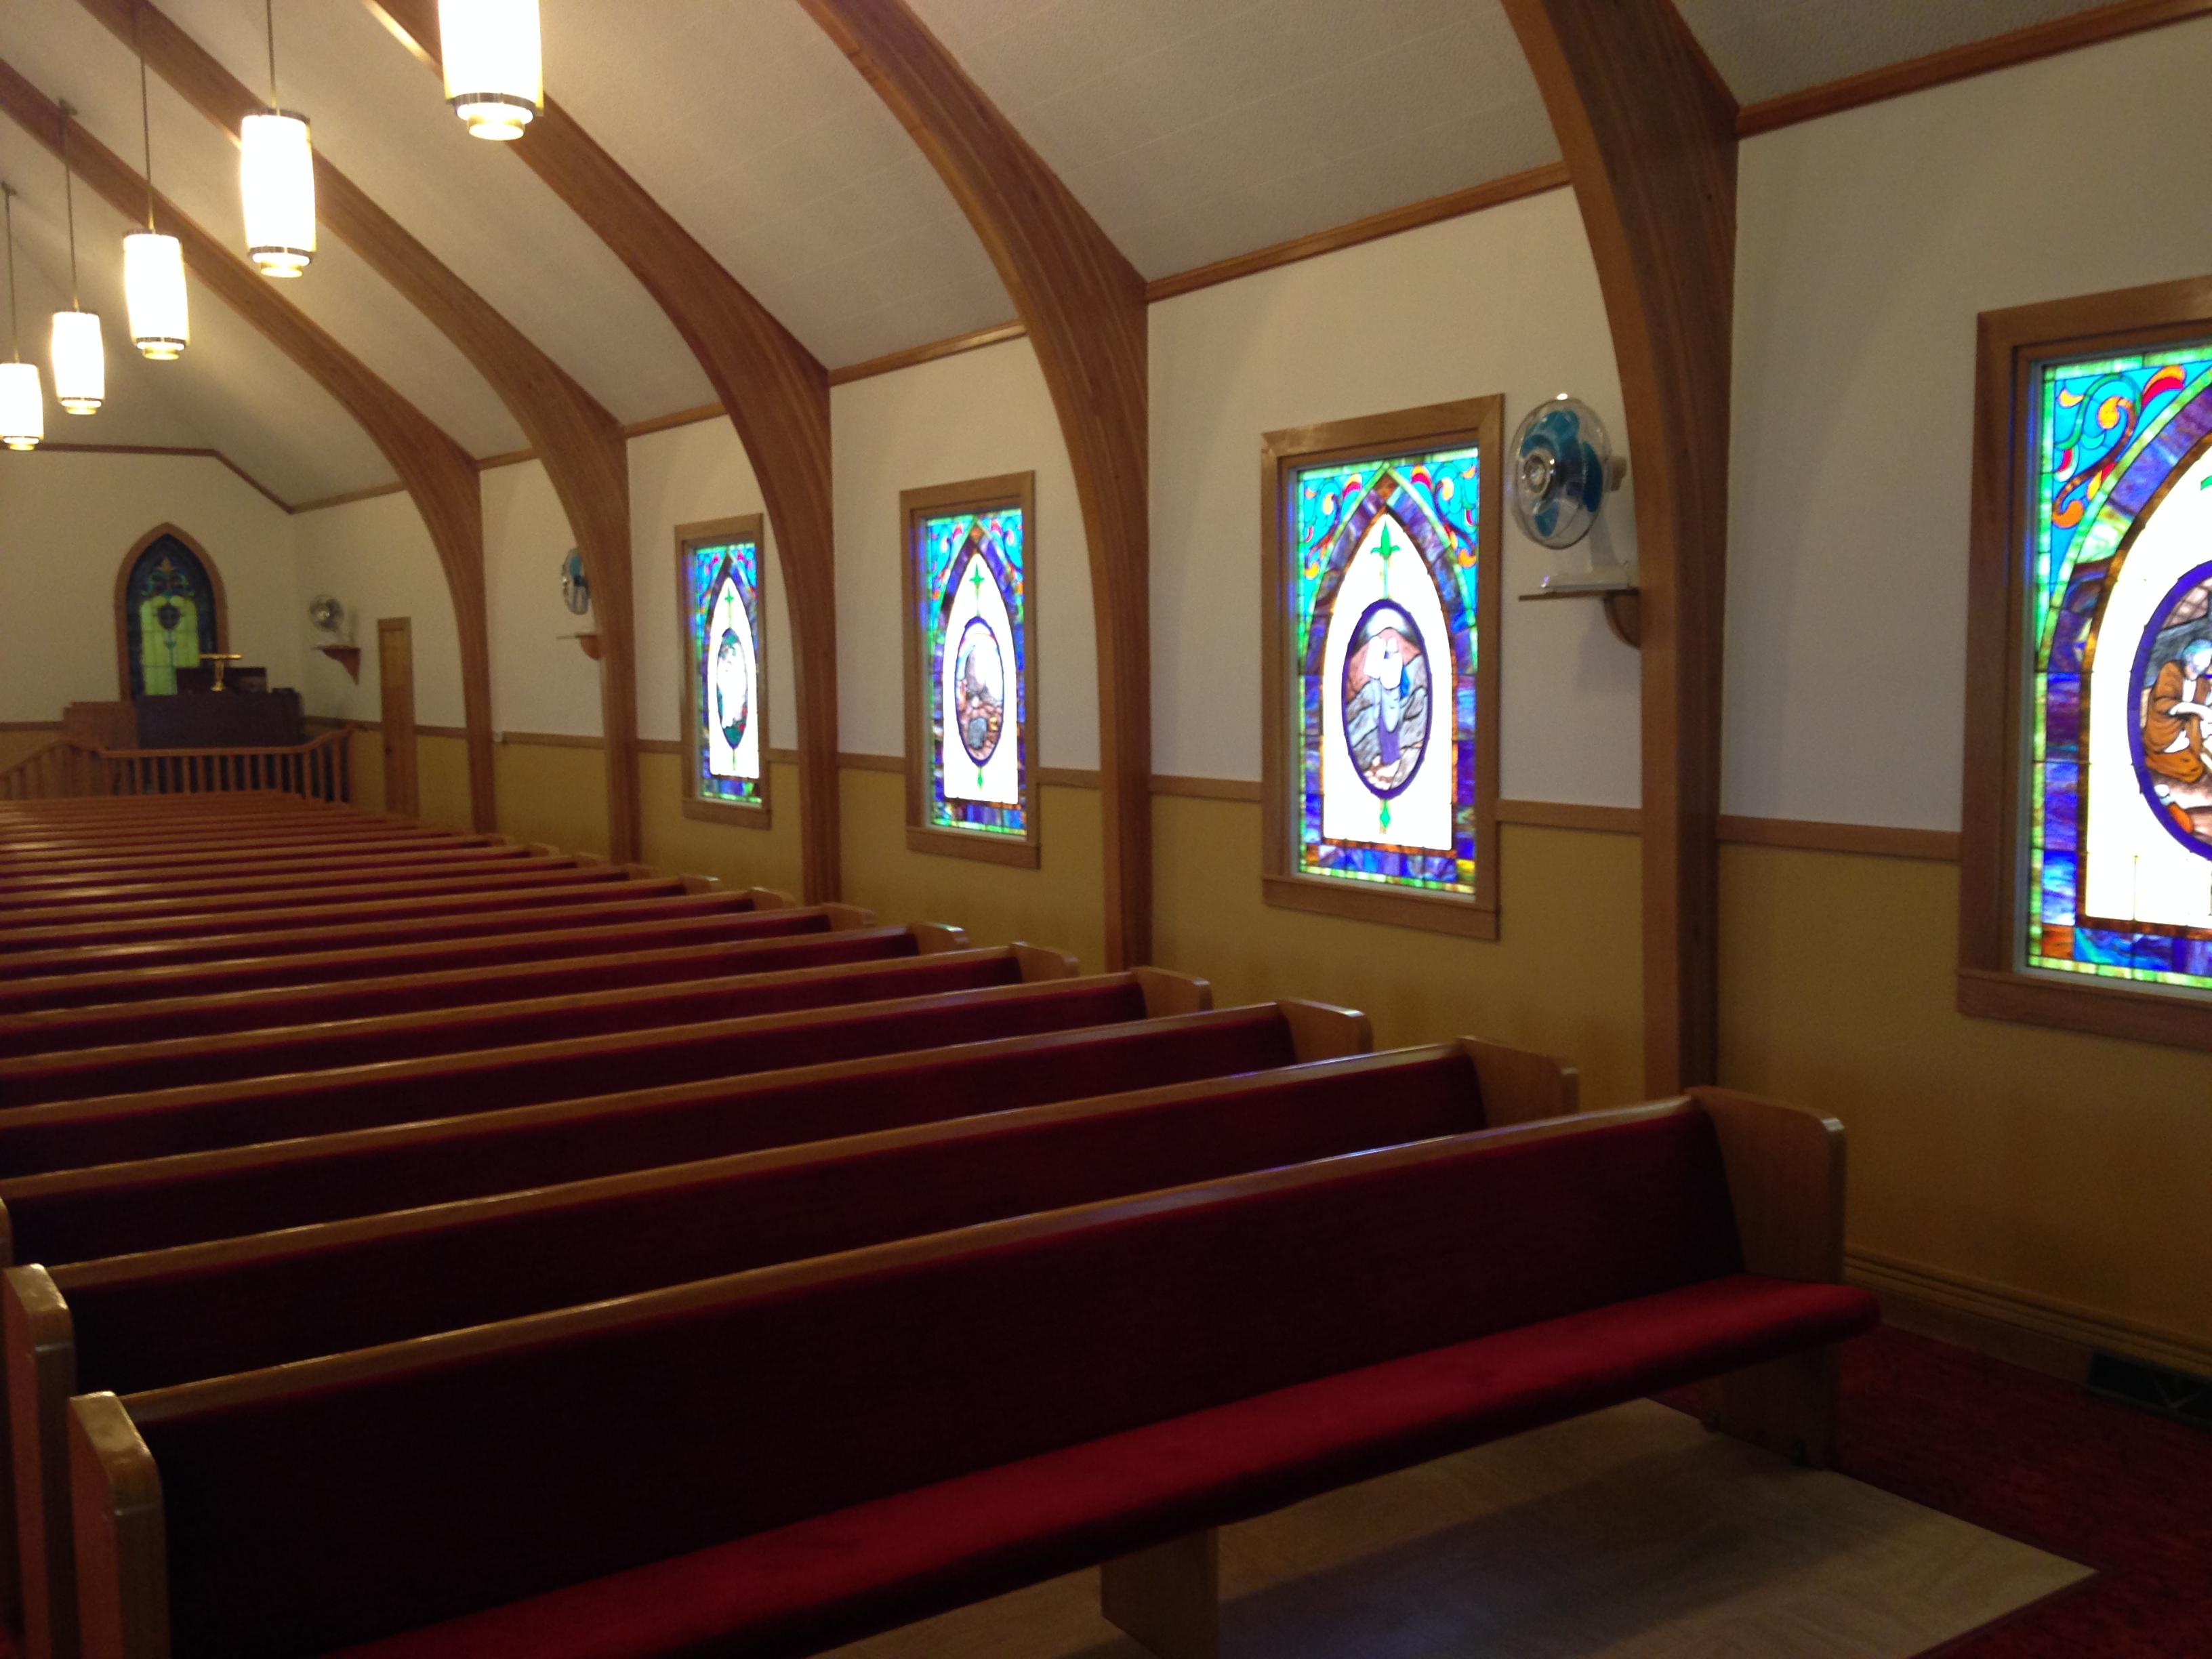 Church refurbishment  new carpet paint wood paneling